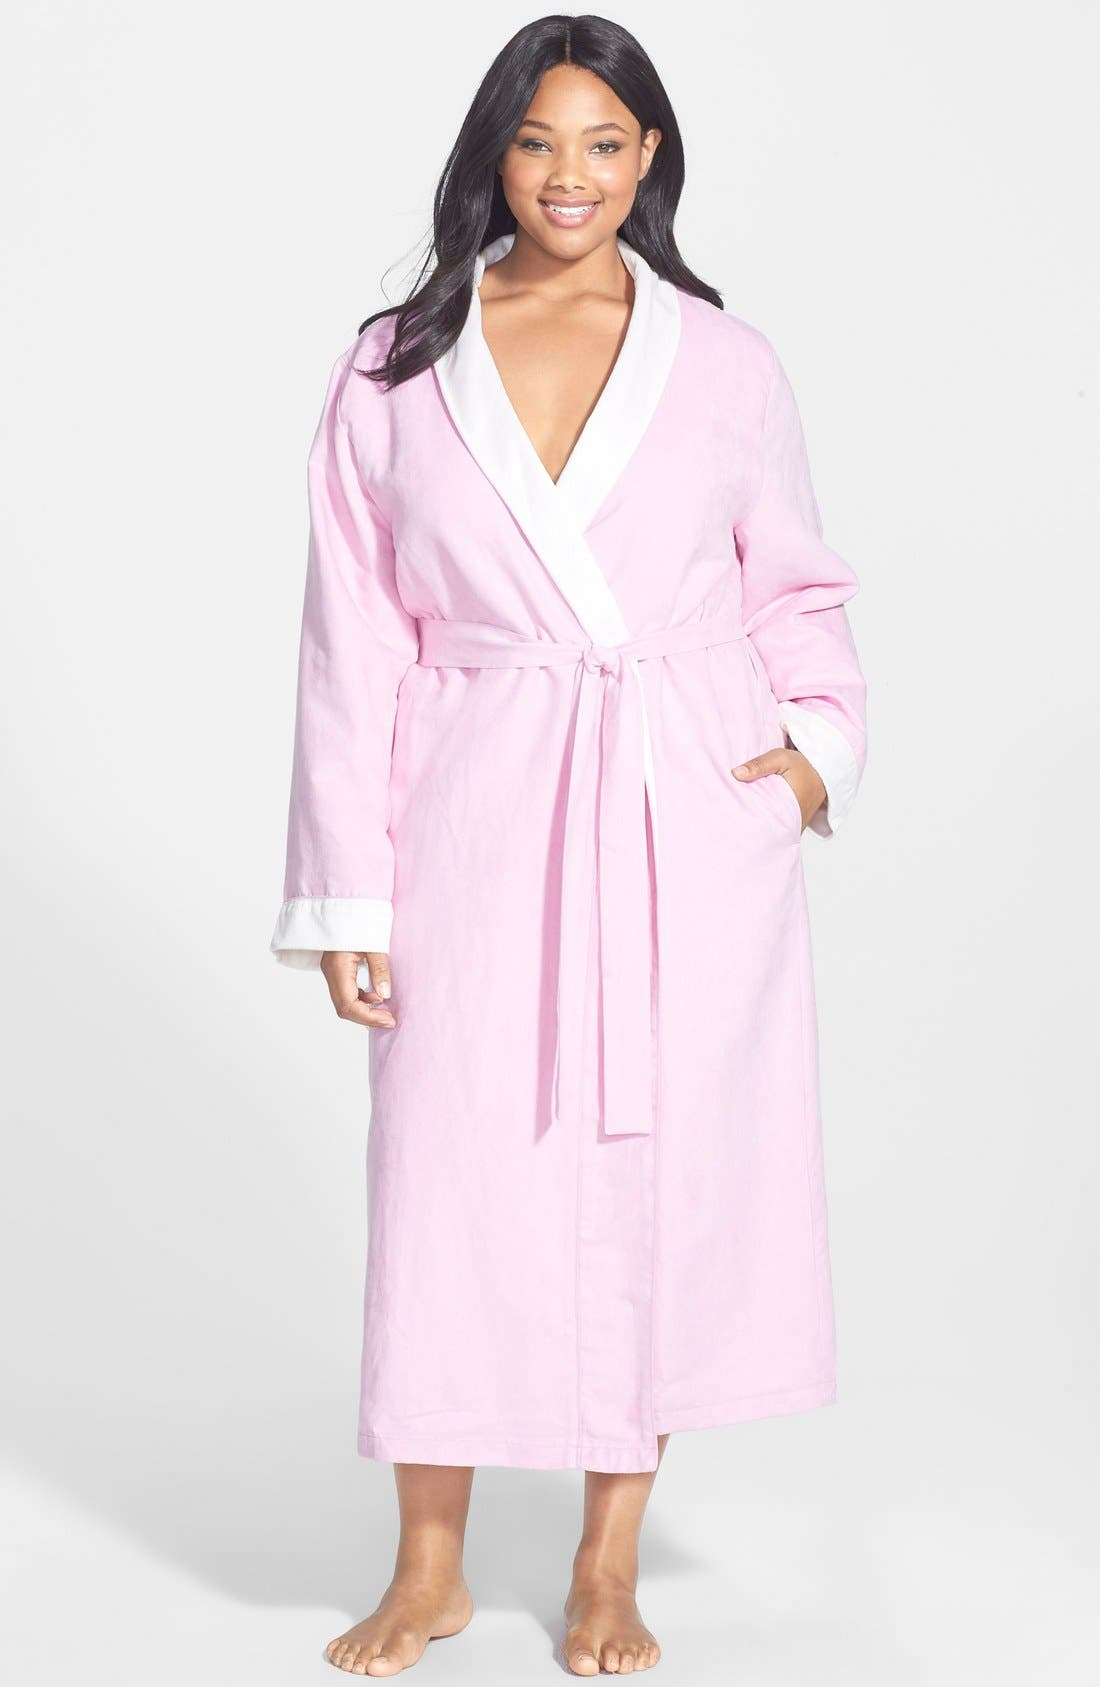 Alternate Image 1 Selected - Nordstrom 'Spa' Robe (Plus)